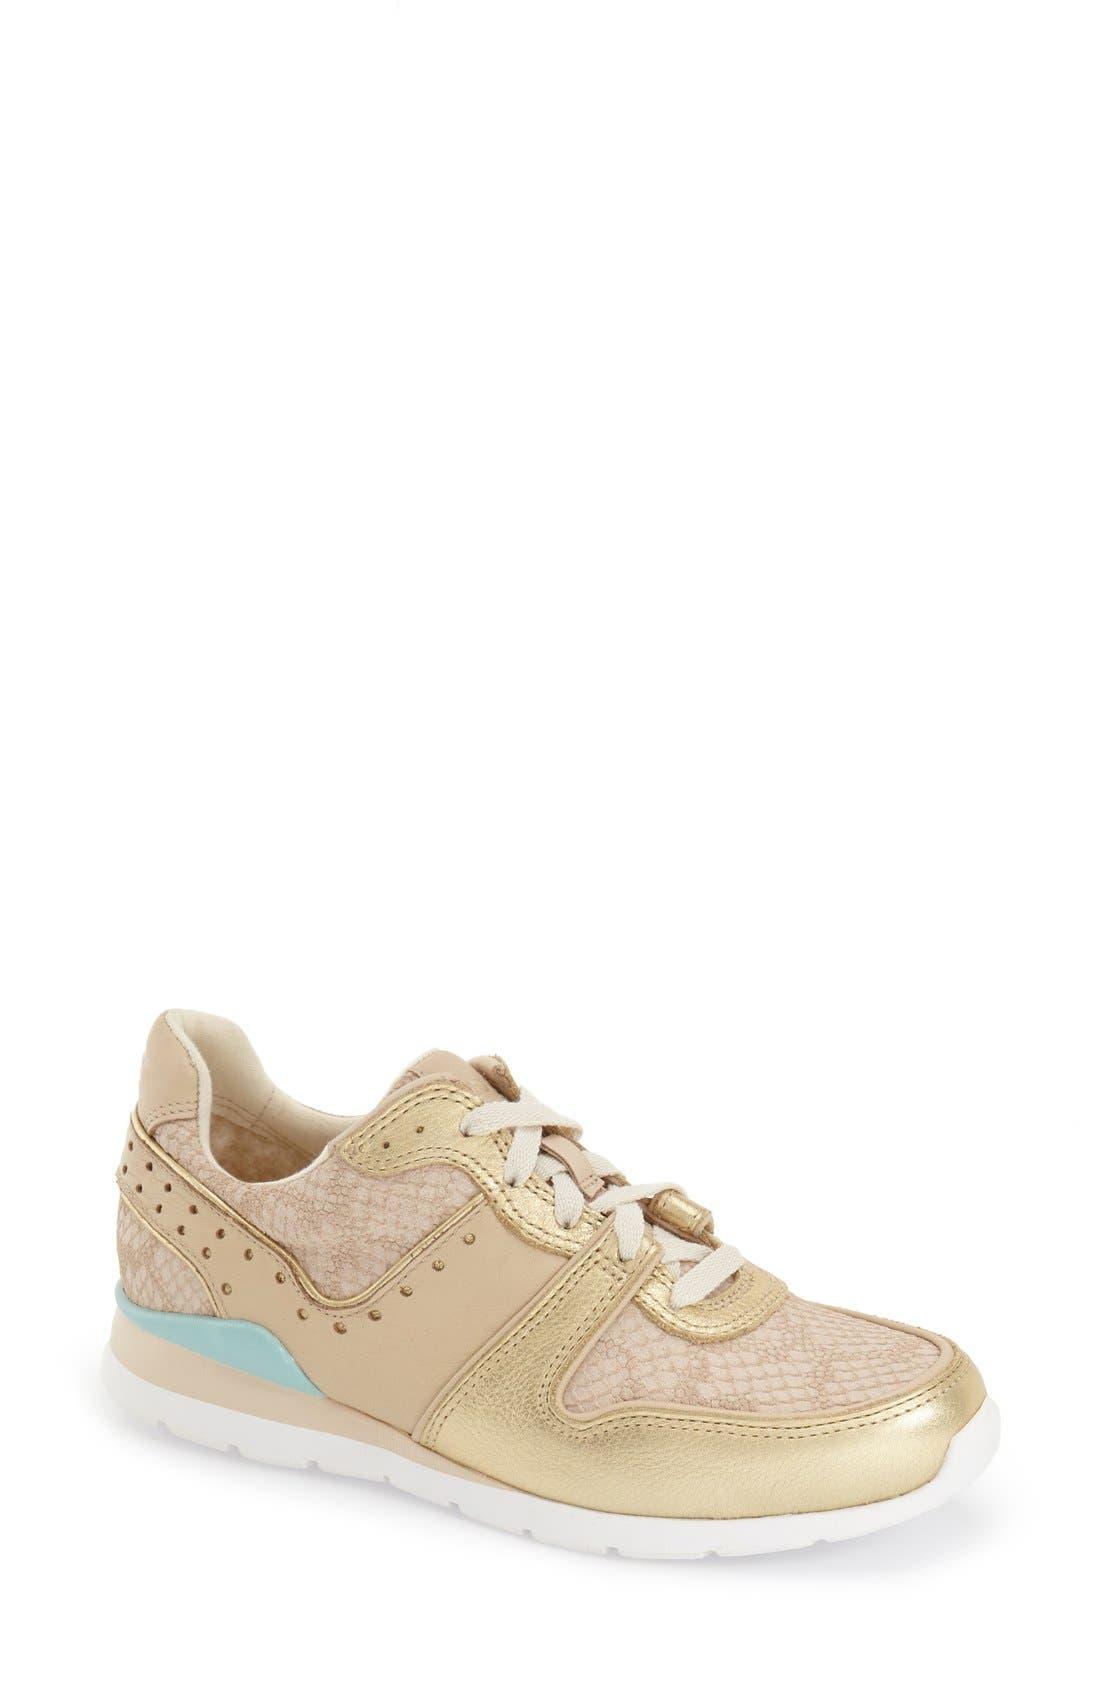 Alternate Image 1 Selected - UGG® Deaven Sneaker (Women)